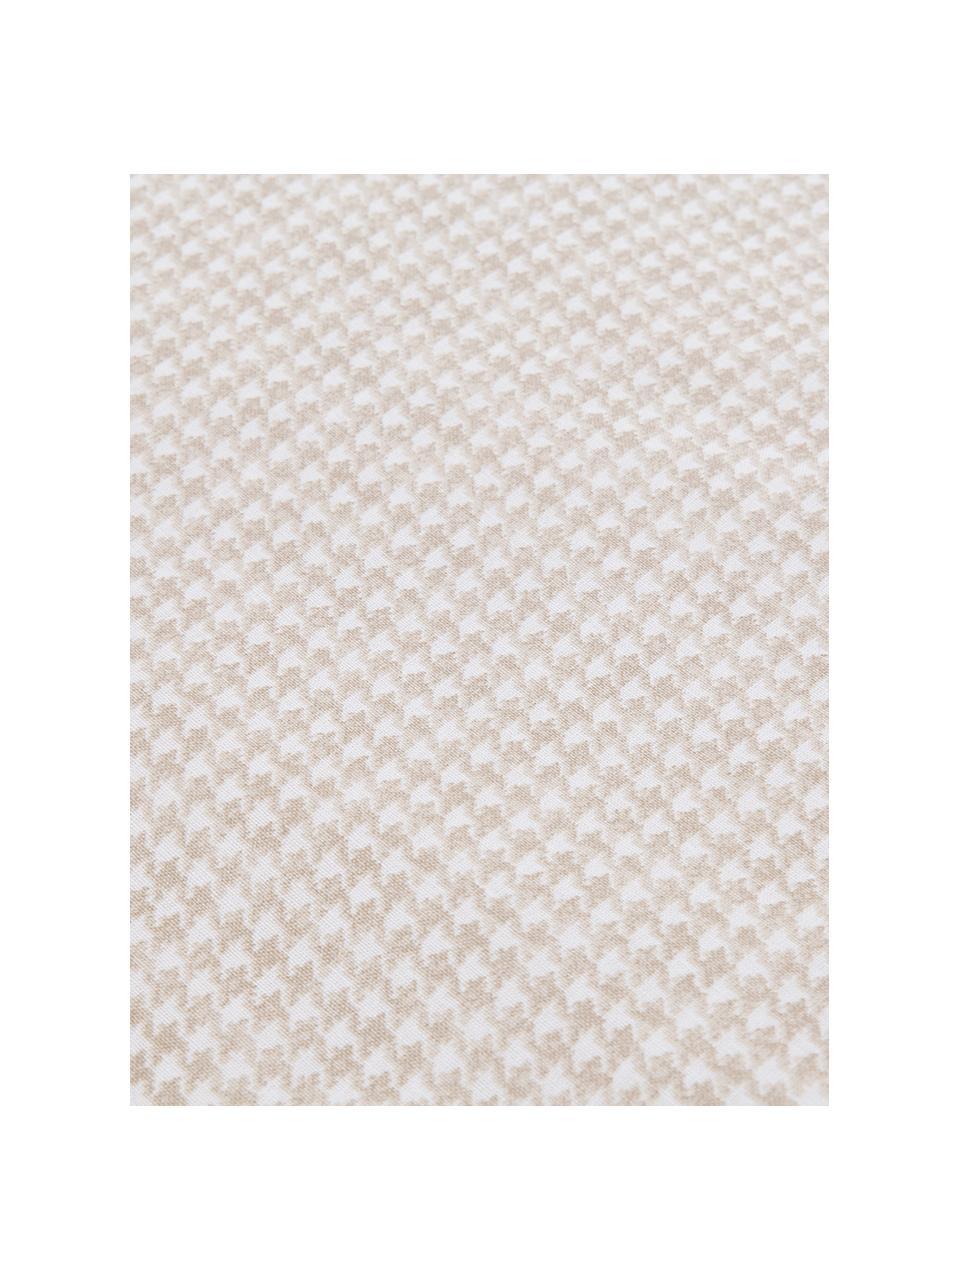 Parure copripiumino in cotone ranforce Grady, Tessuto: Renforcé, Beige, bianco, 250 x 200 cm